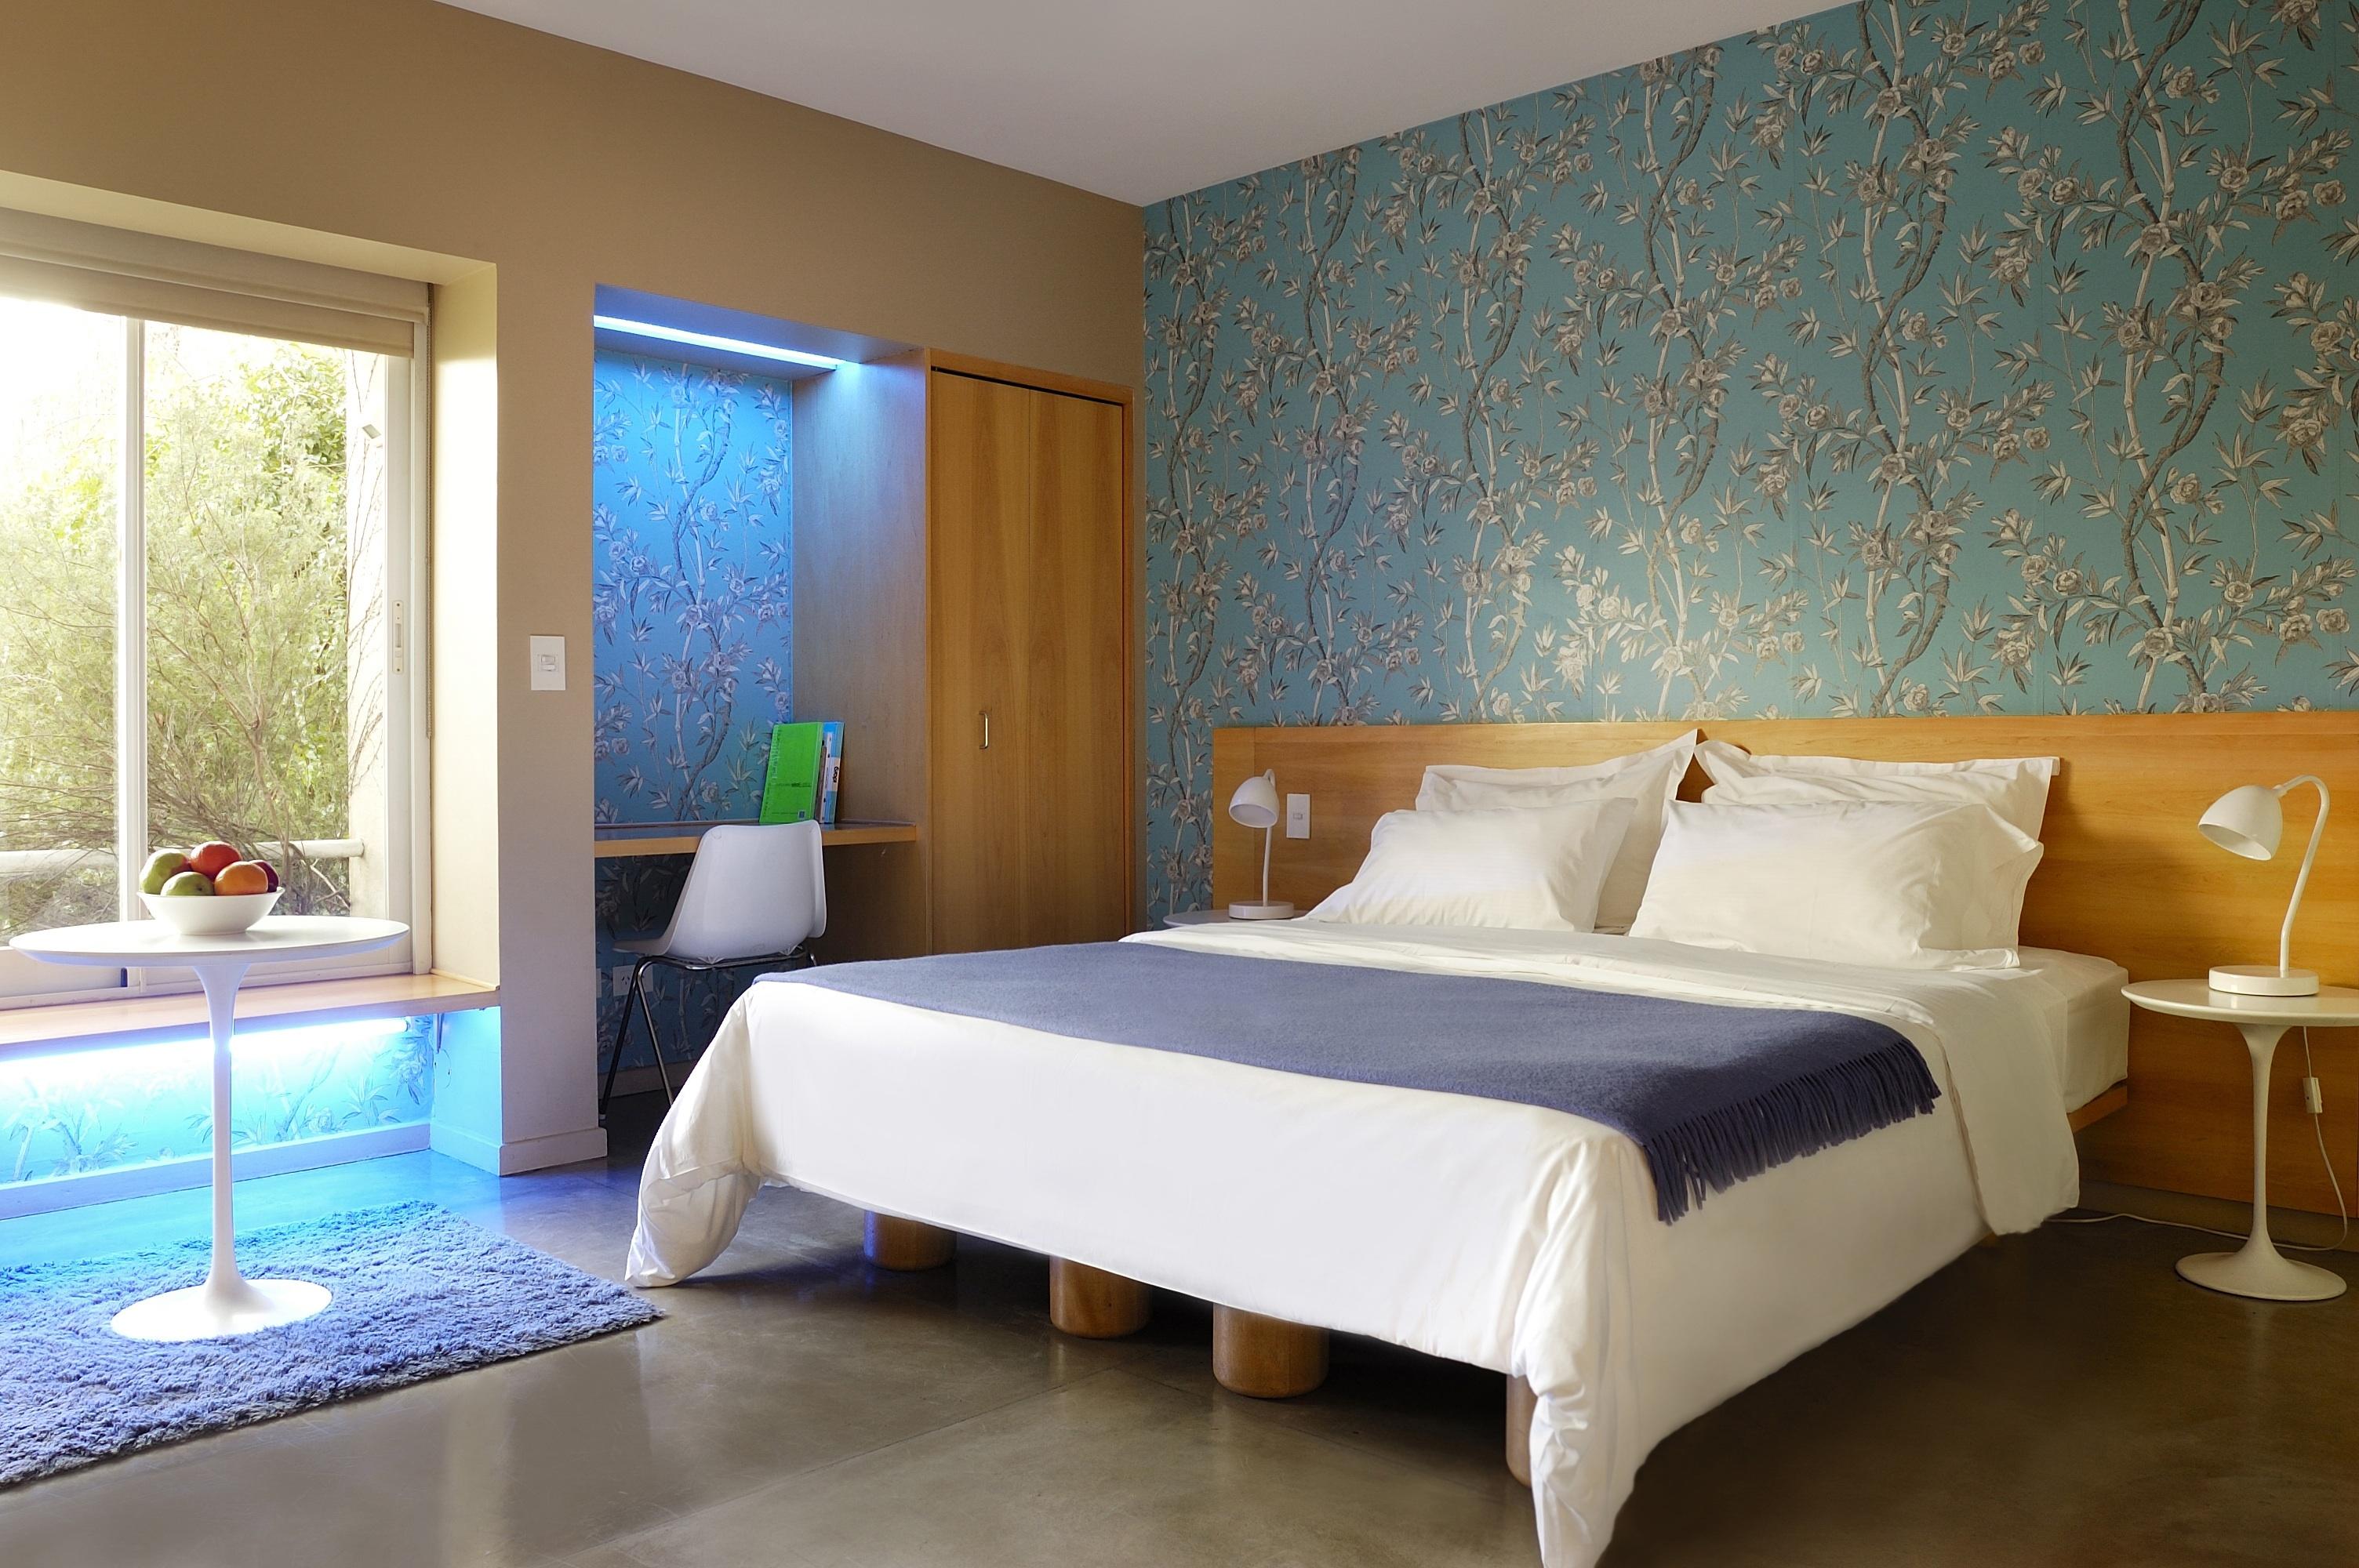 Hotel-1080p